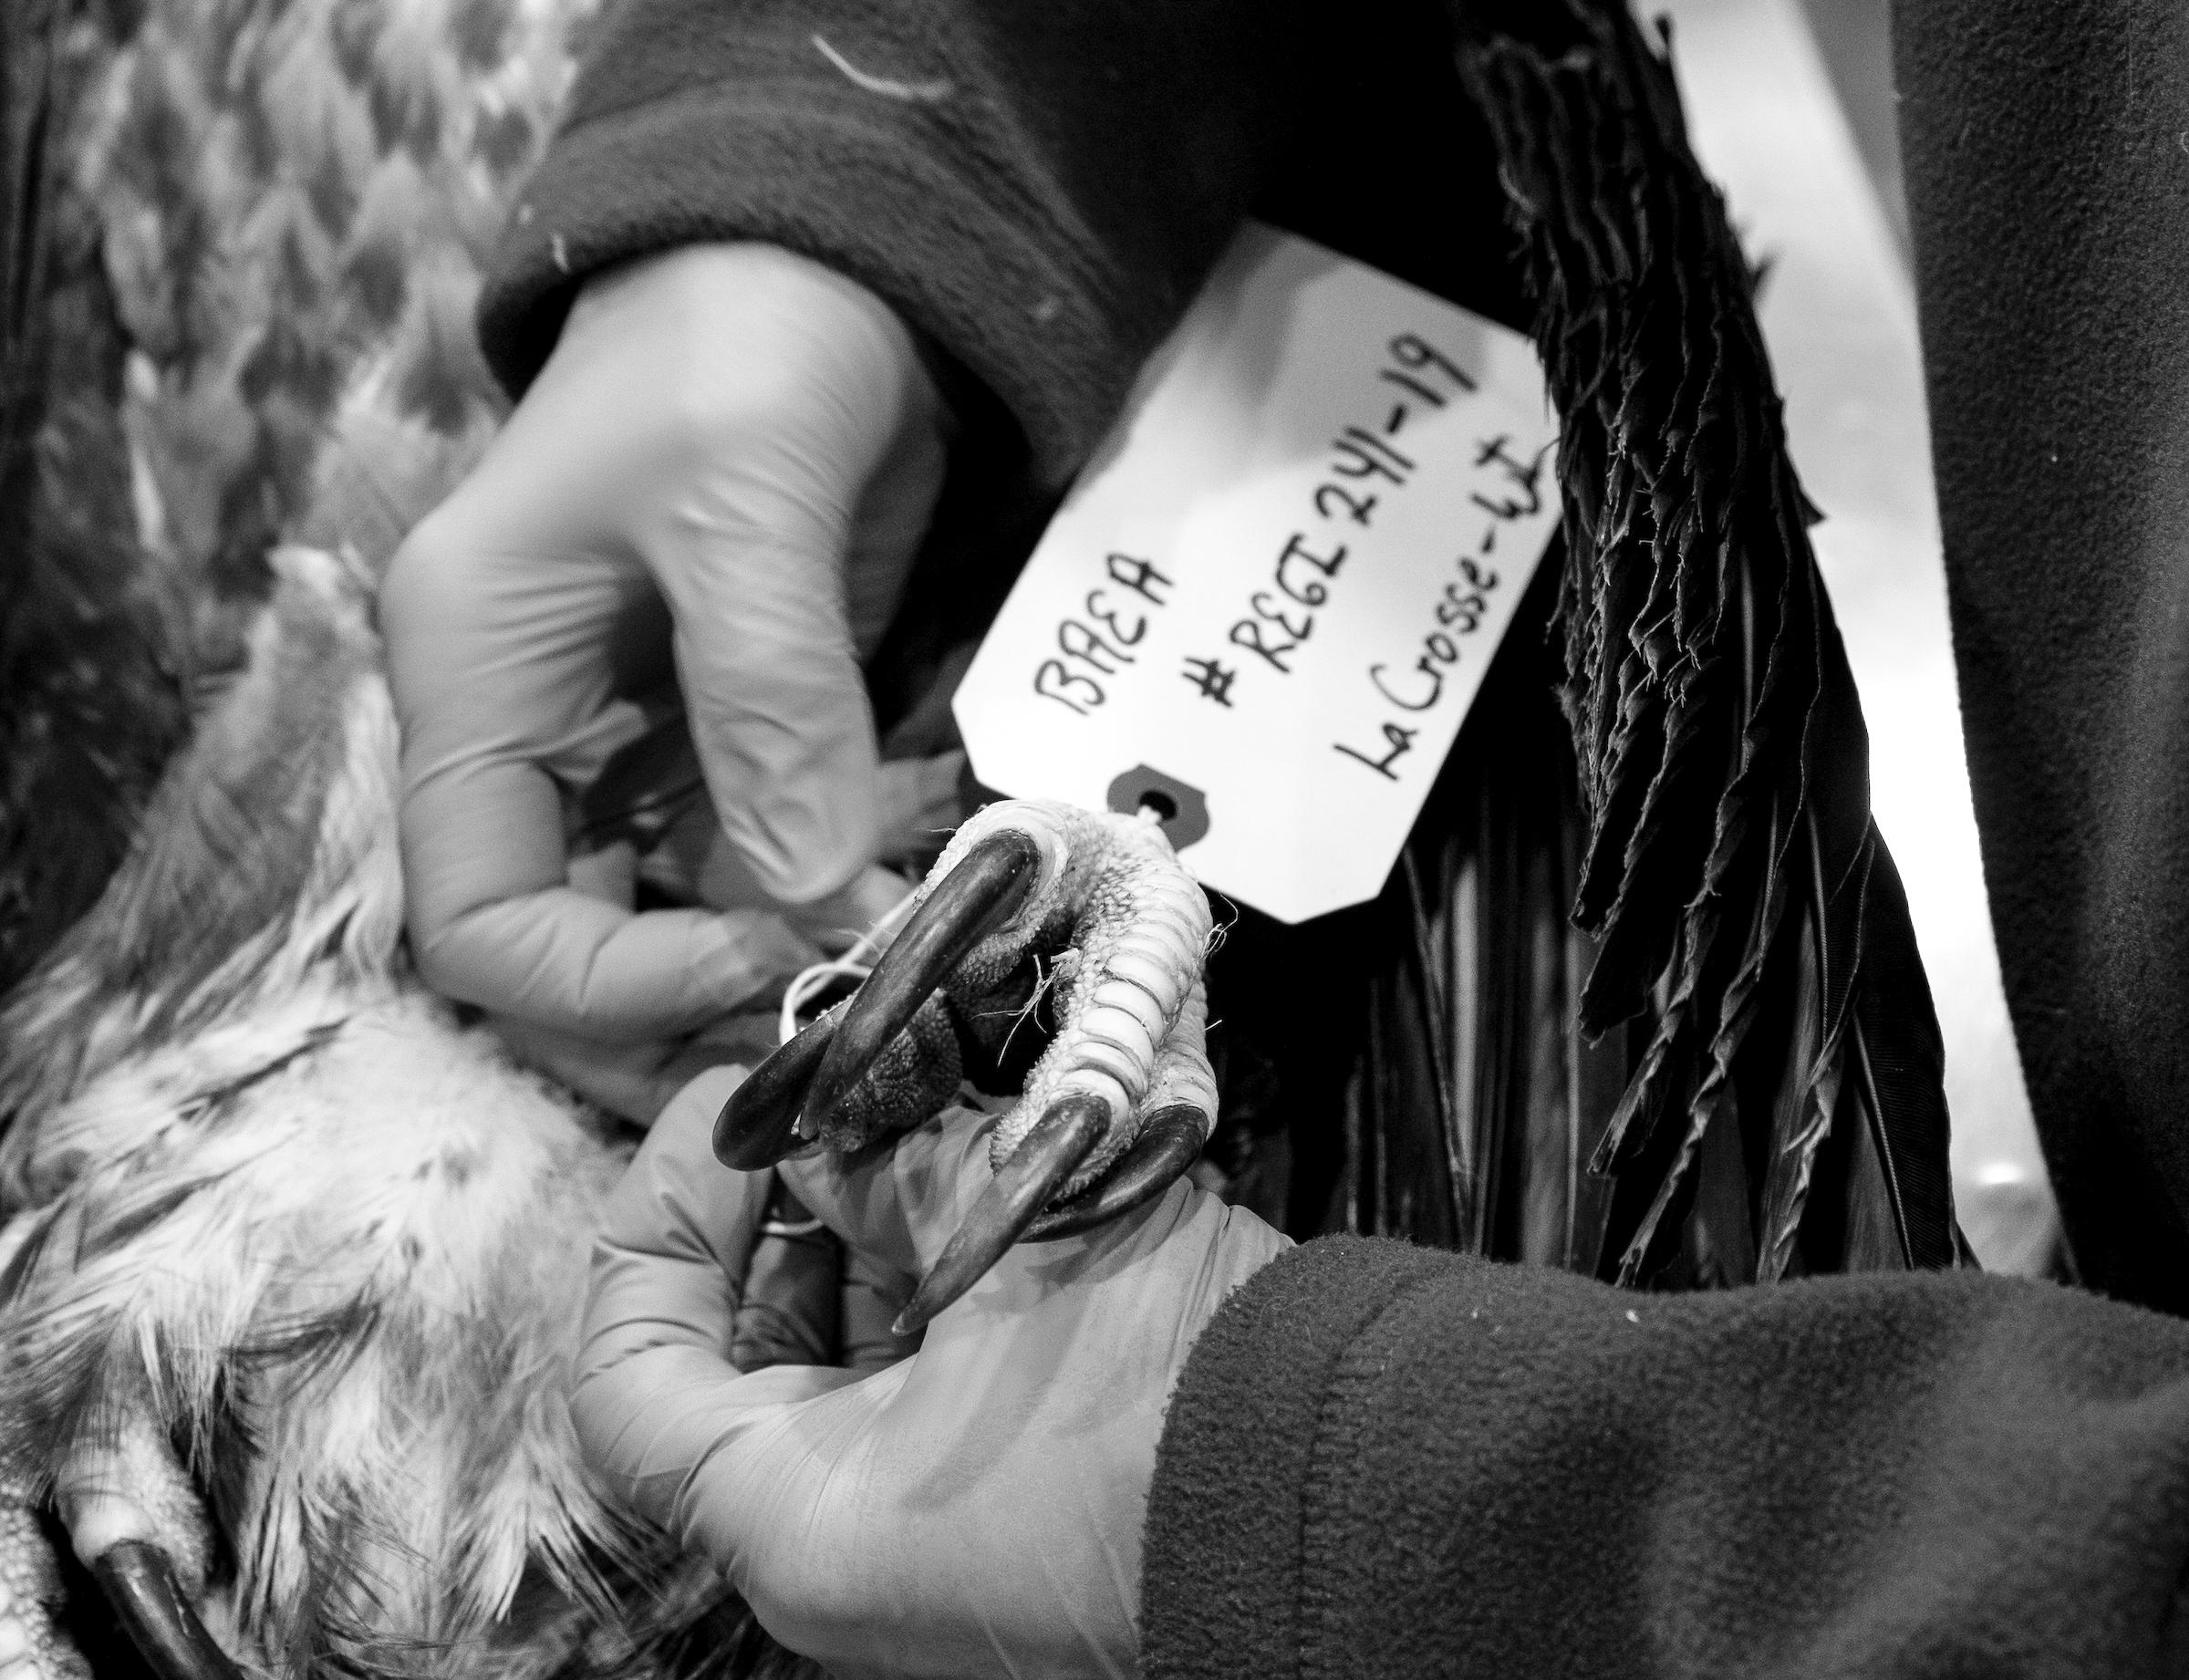 The carcass of Bald Eagle that dies at REGI is tagged. Tom Lynn